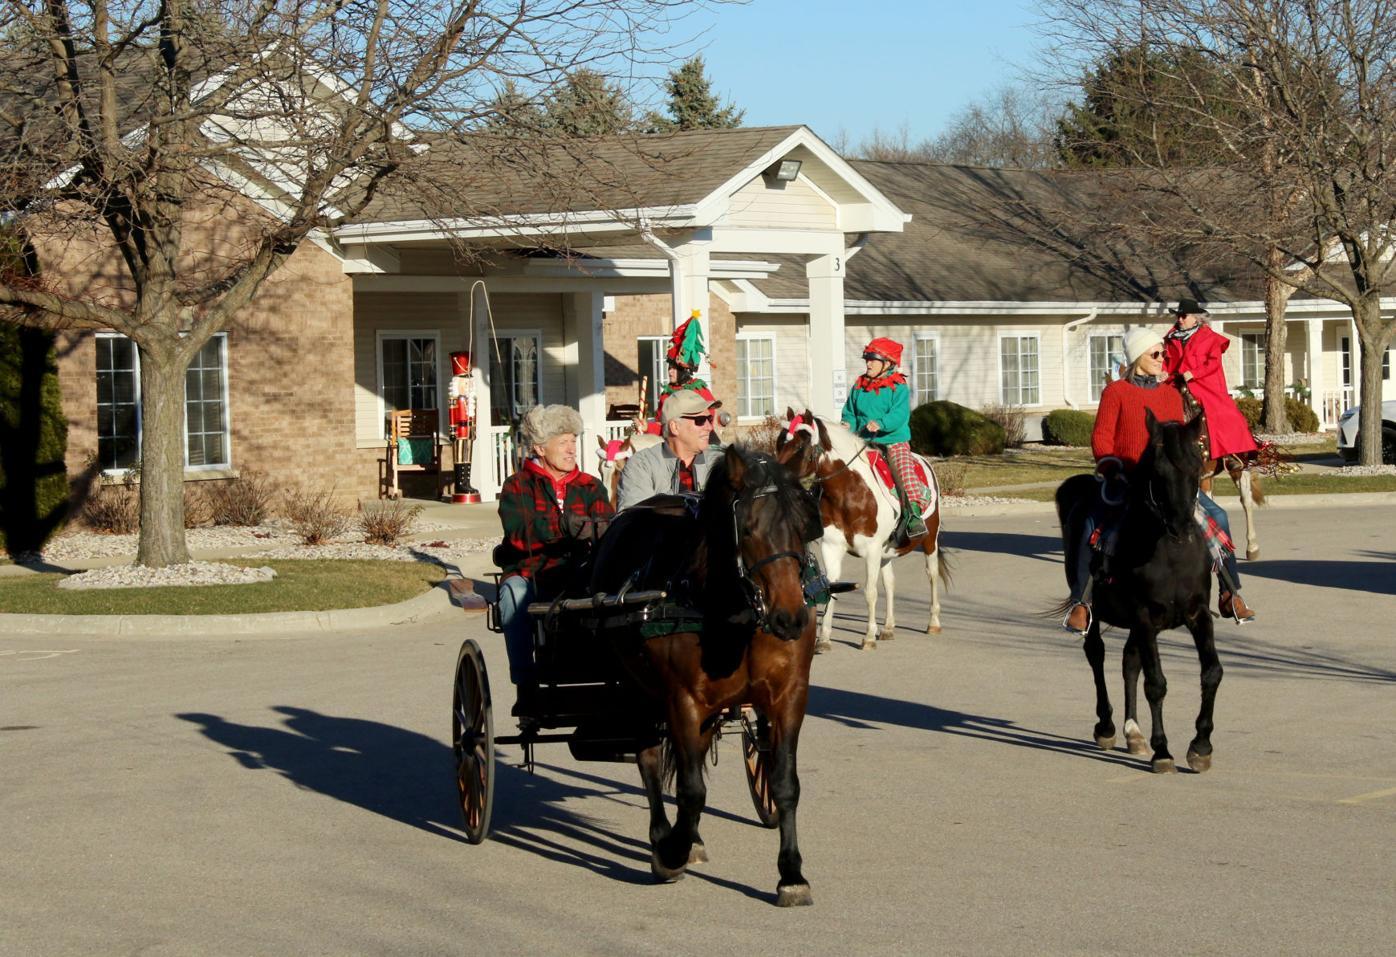 Carolers on horseback 2